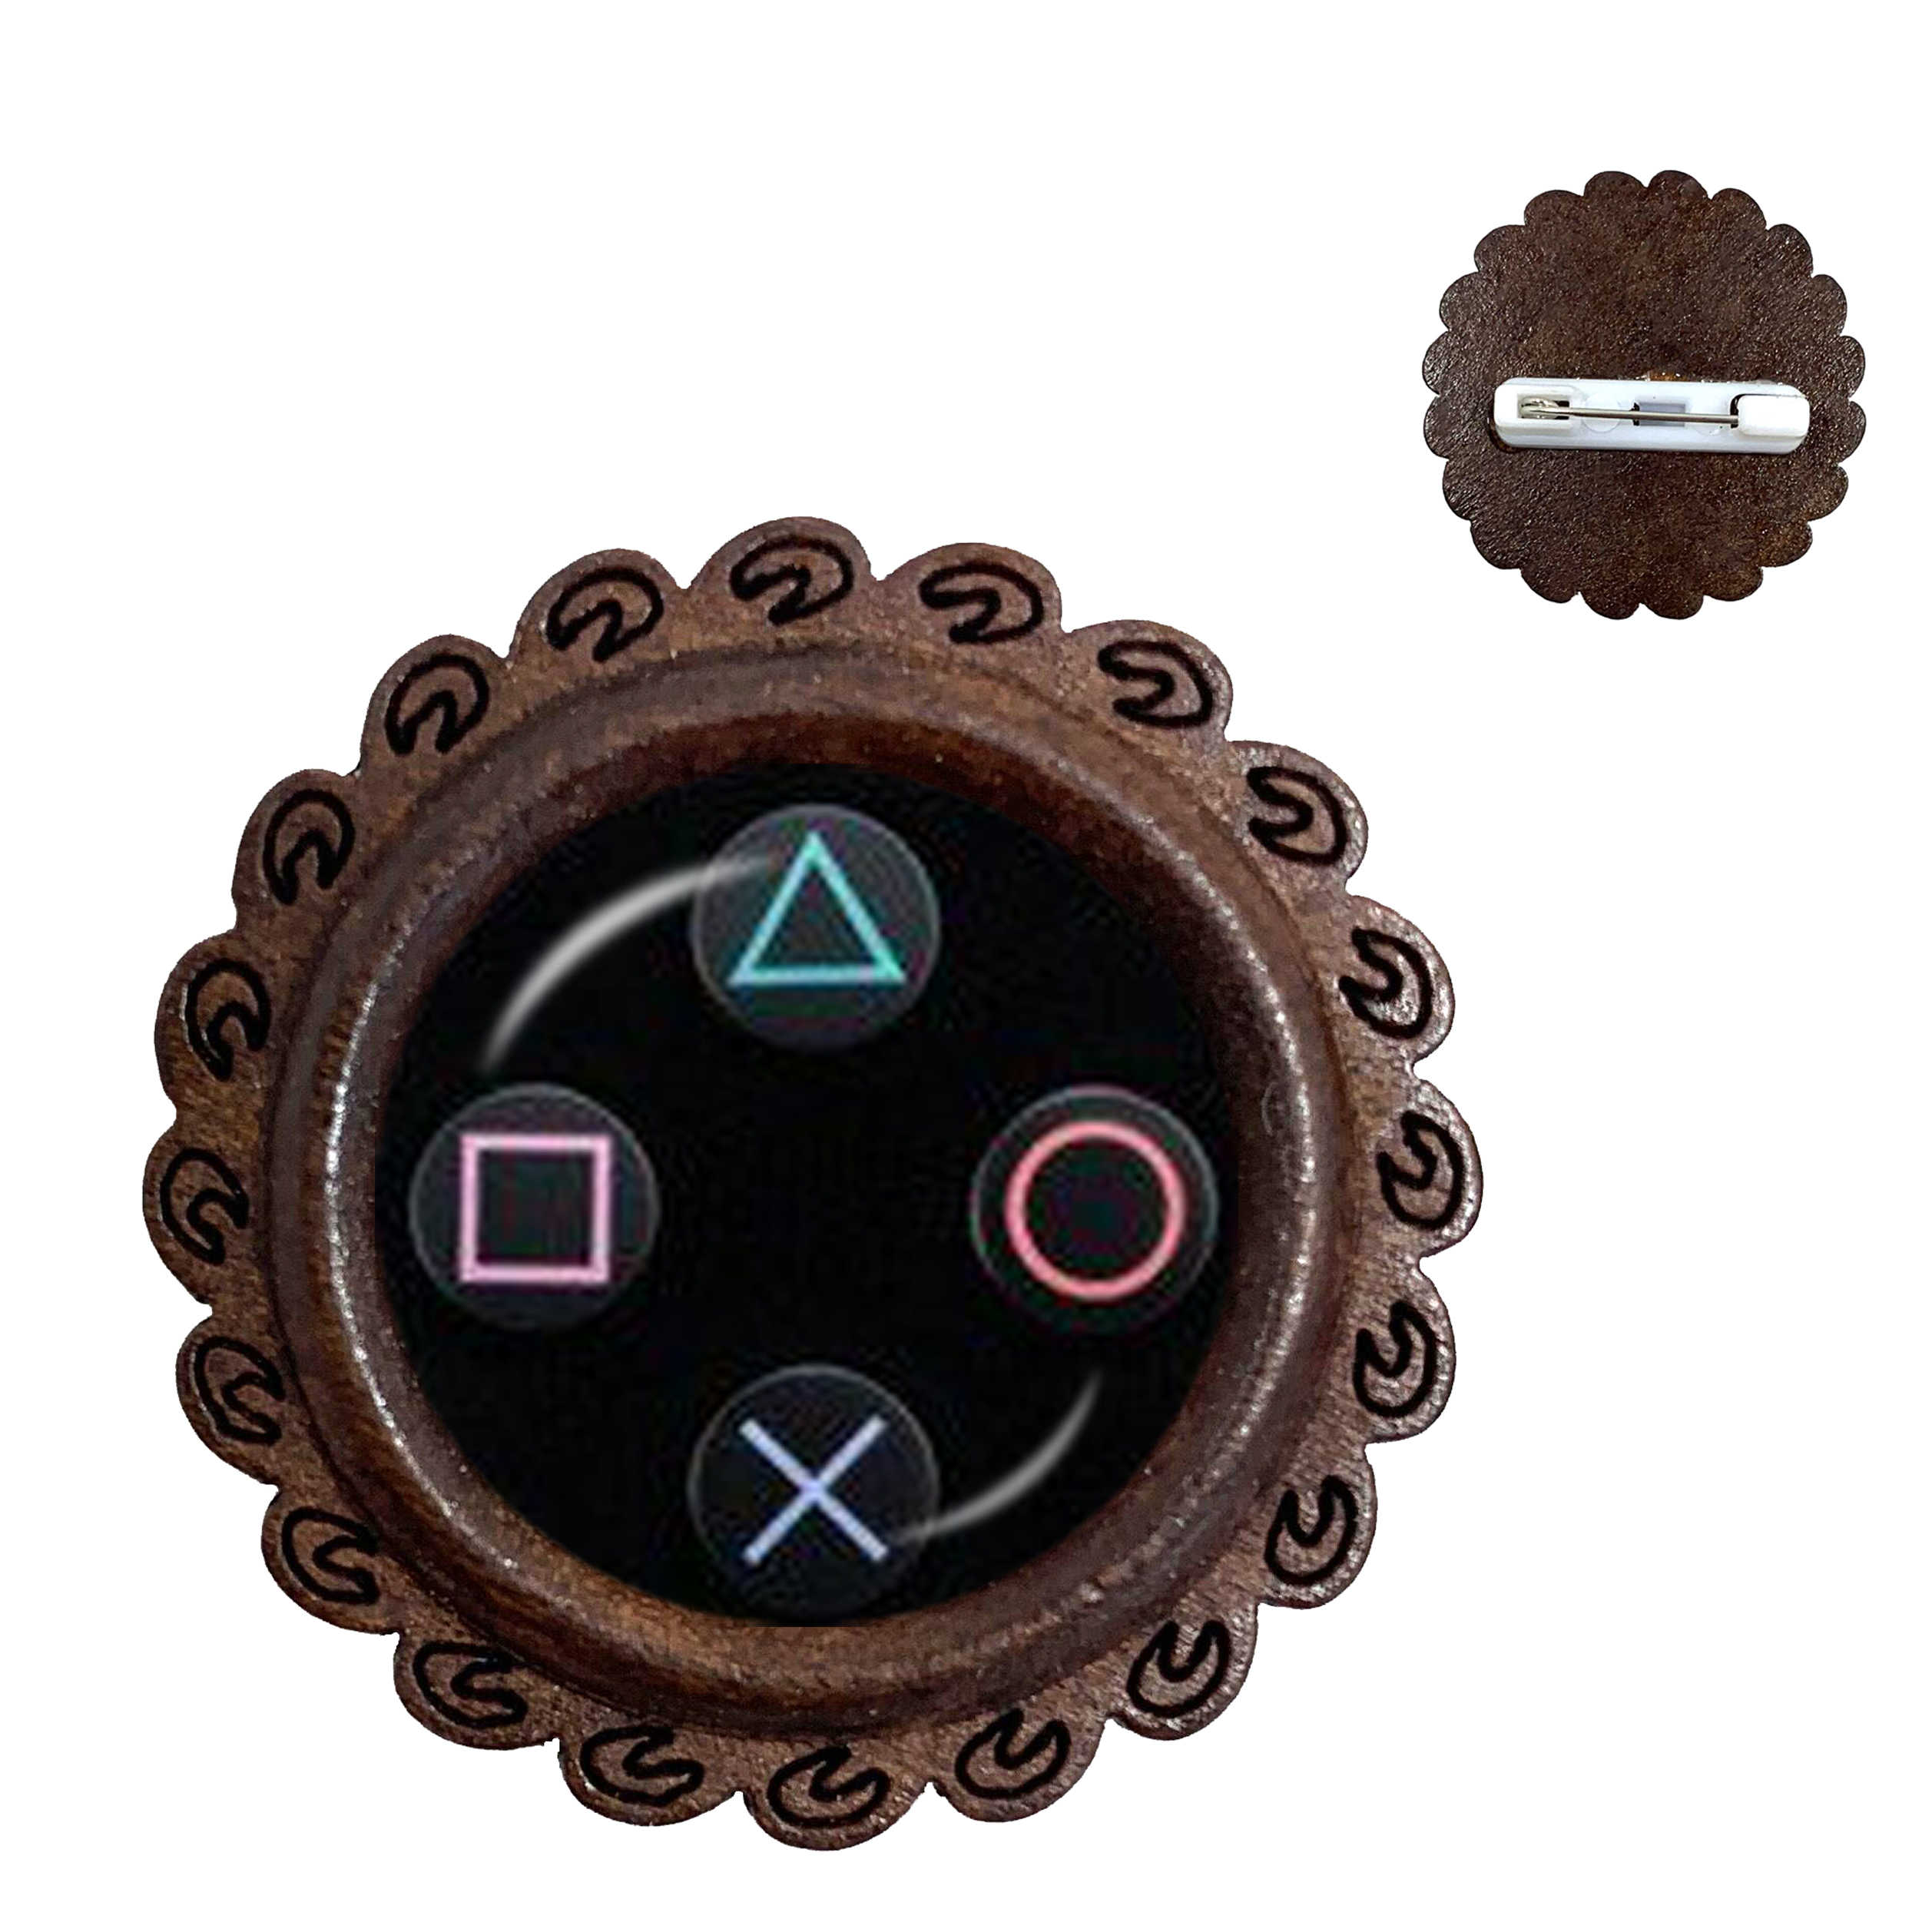 VINTAGE วิดีโอเกมเข็มกลัด Cool Men GAMING Gamer Pins ของขวัญ Retro Controller Gamepad ไม้เข็มกลัด Pins ของขวัญ